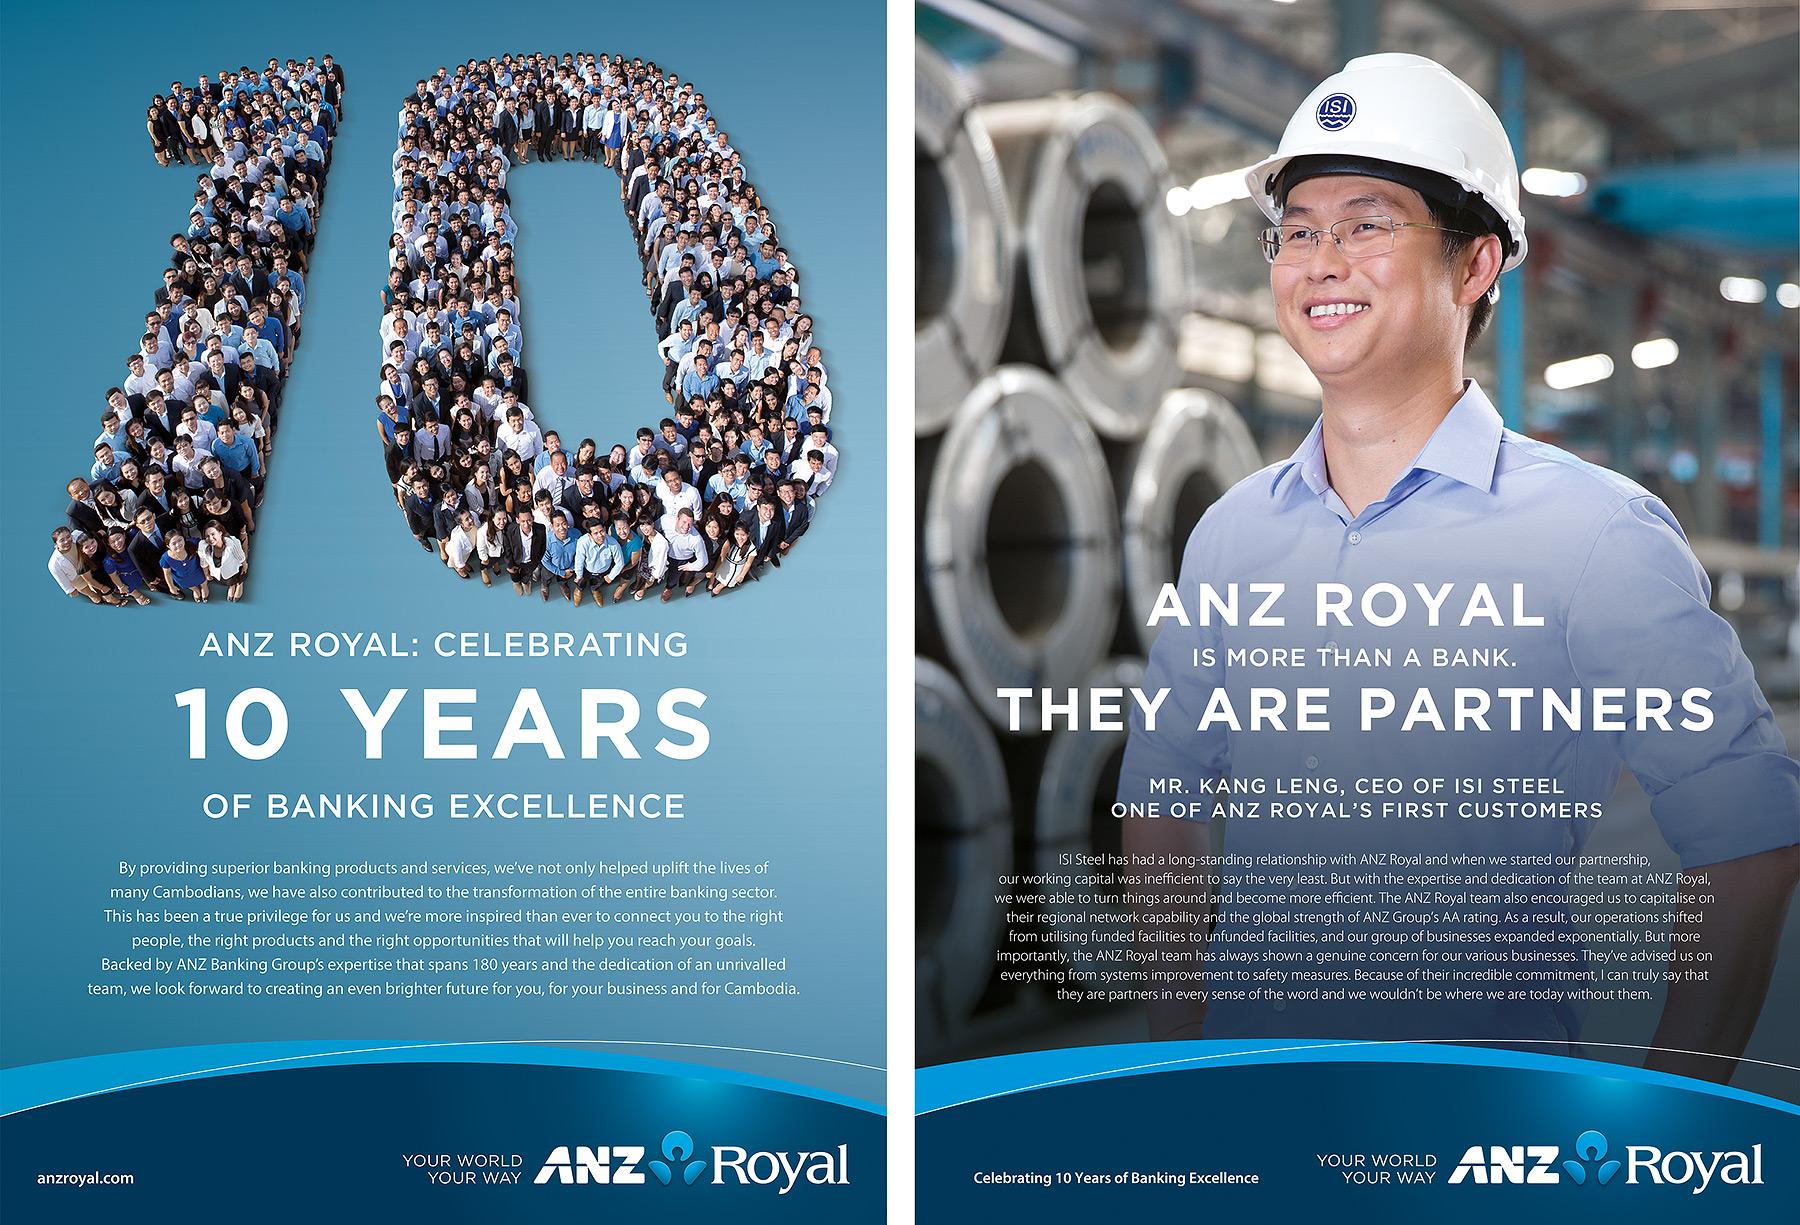 ANZ Royal 10th Anniversary 2015